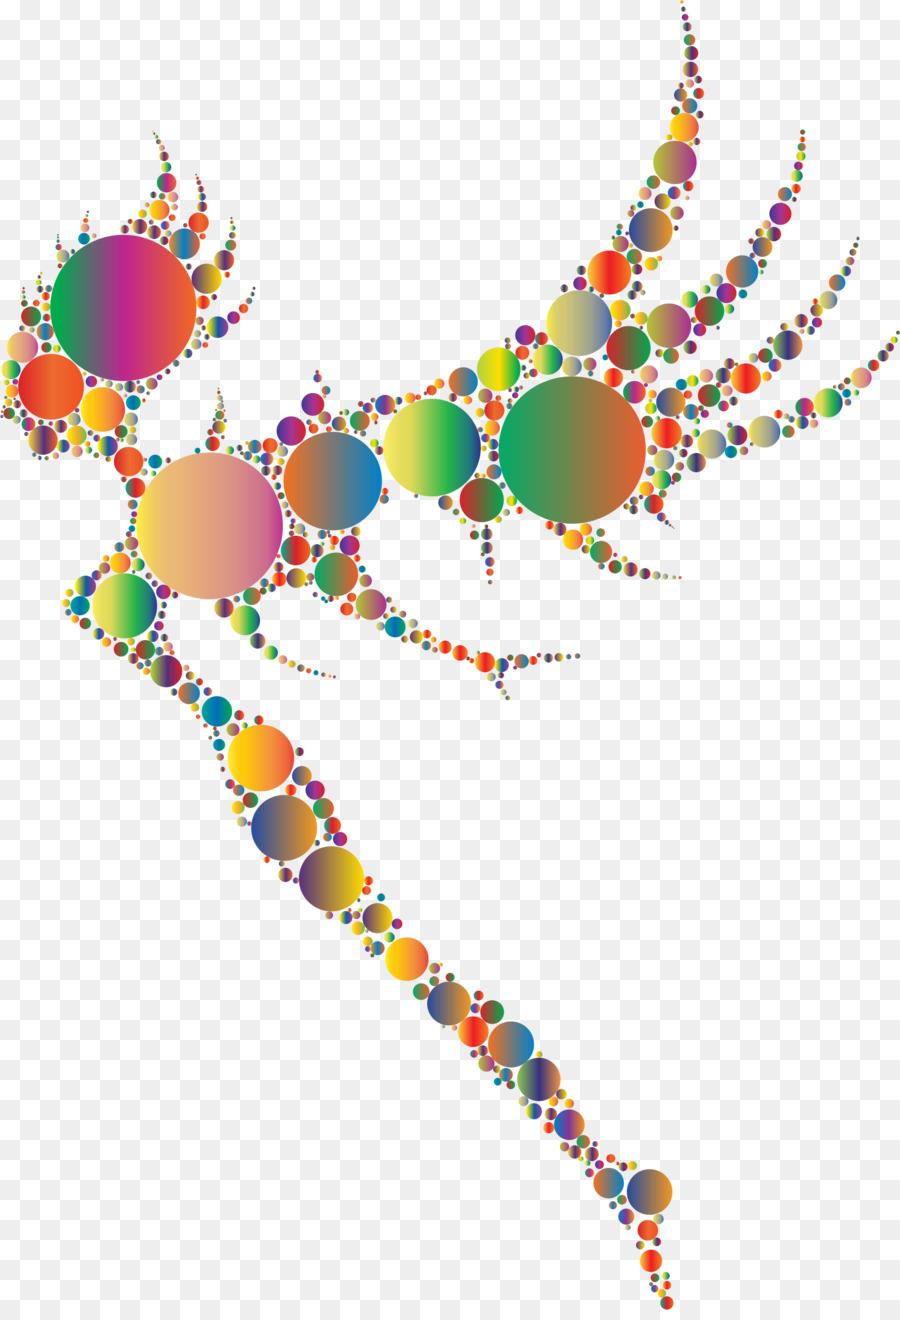 Fairy Clip art - channing tatum-Fairy Clip art - channing tatum-15